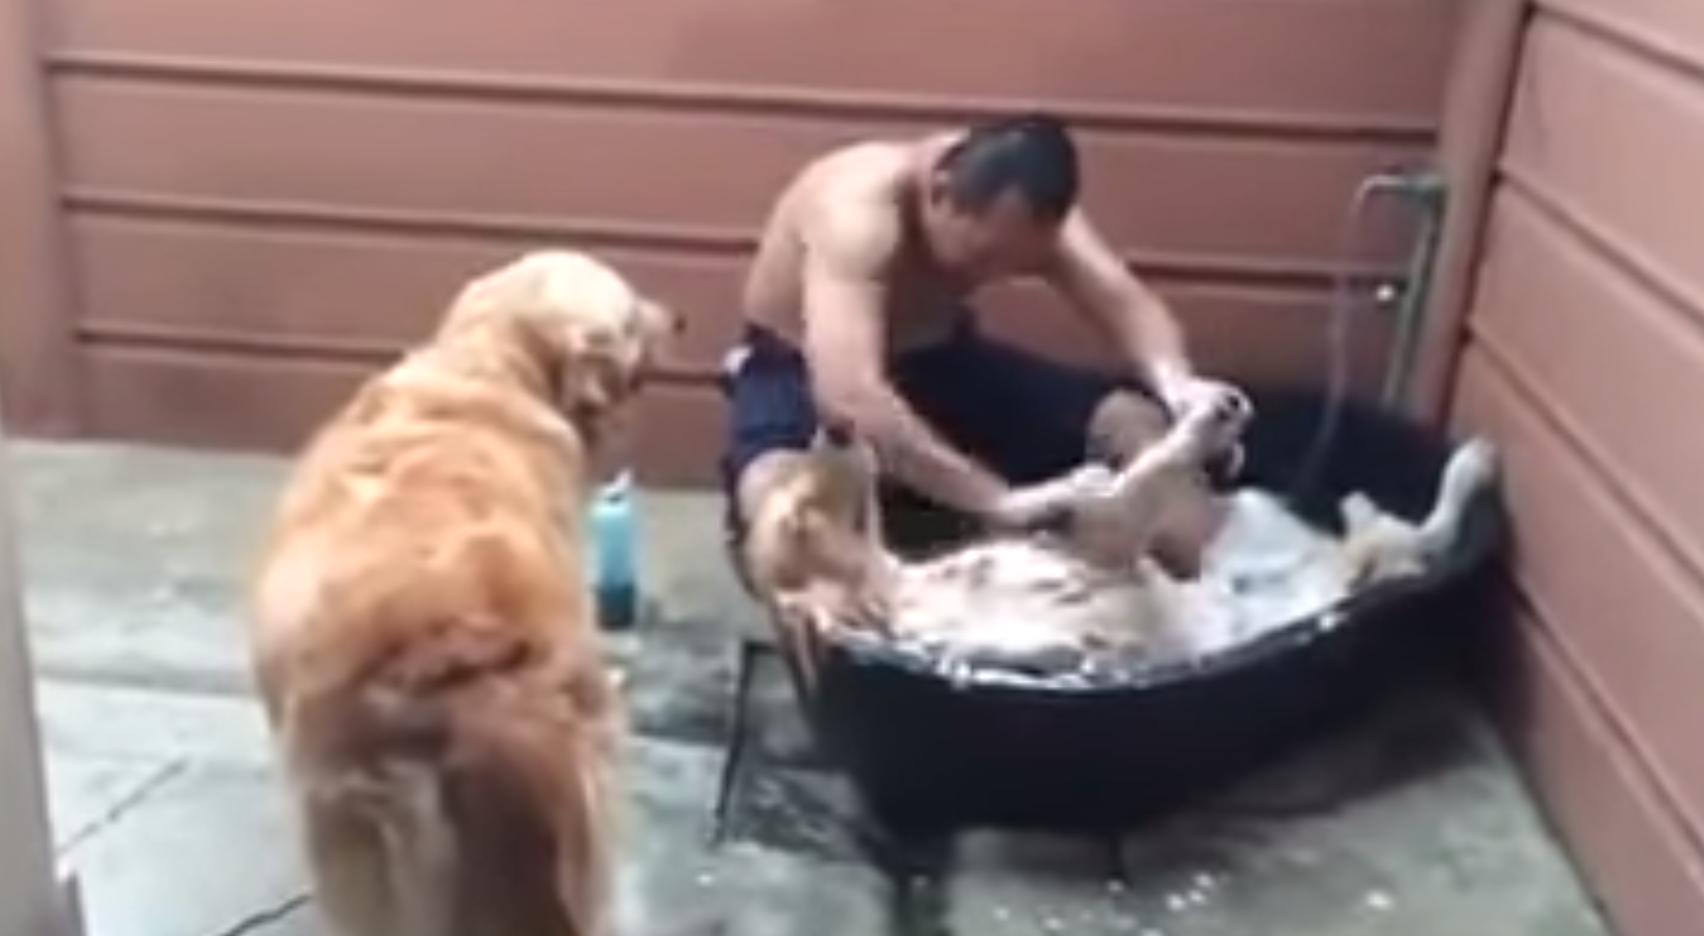 This dog is sure enjoying its bath